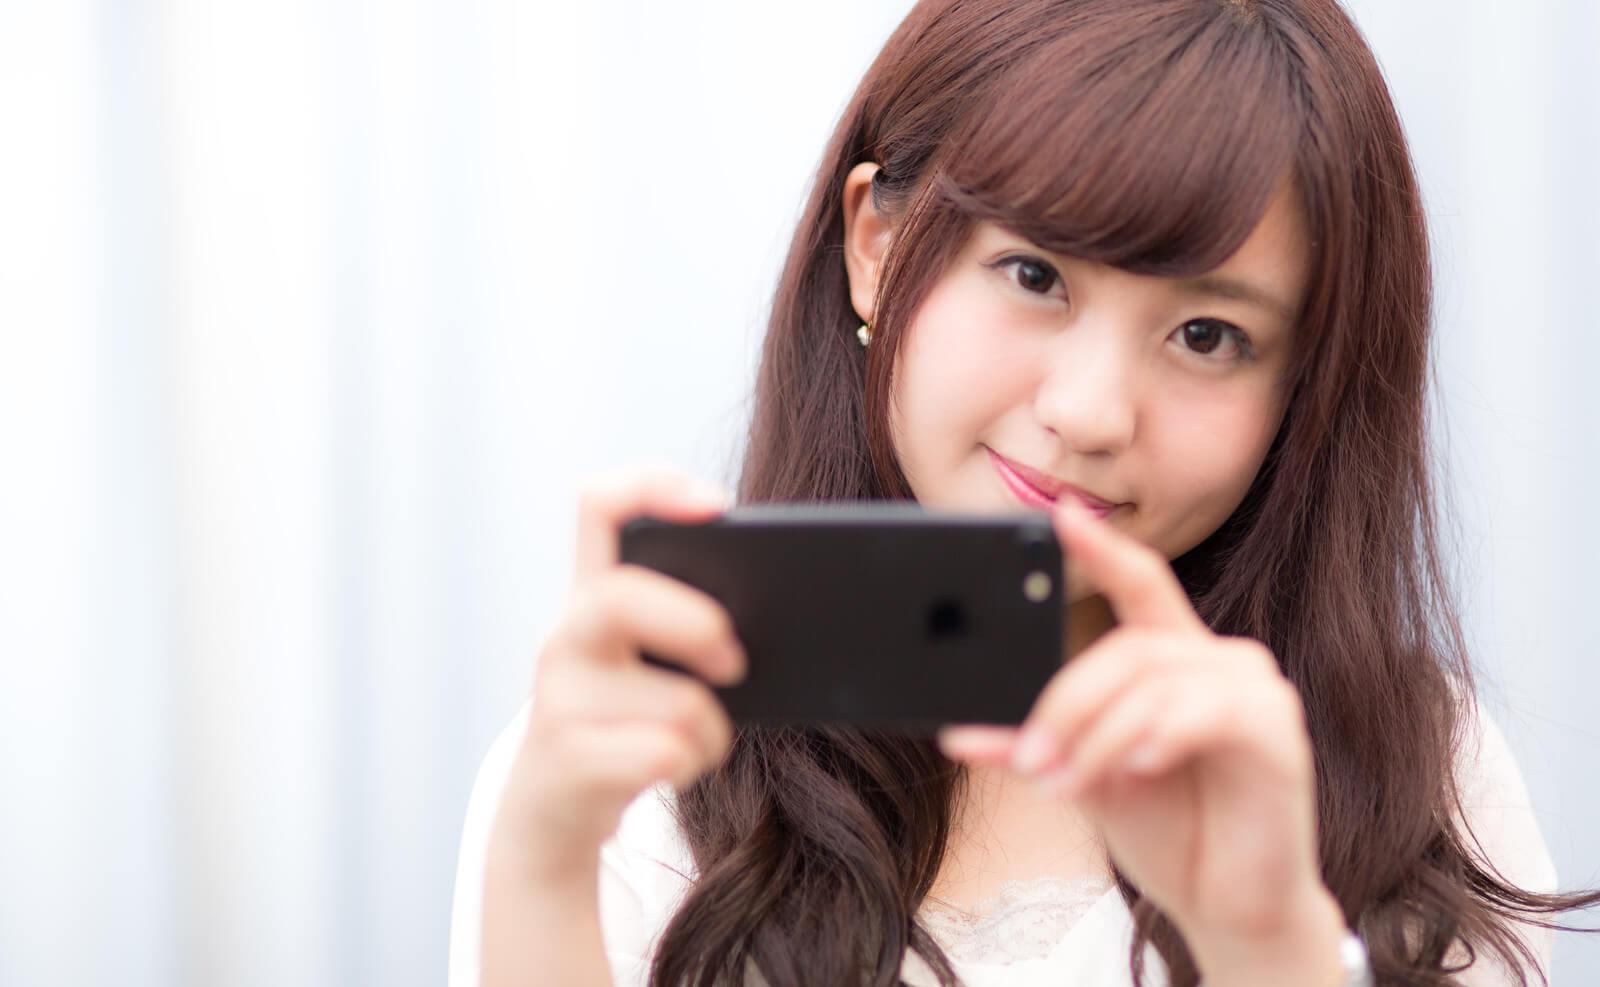 iPhoneでPS4のリモートプレイを使う女性